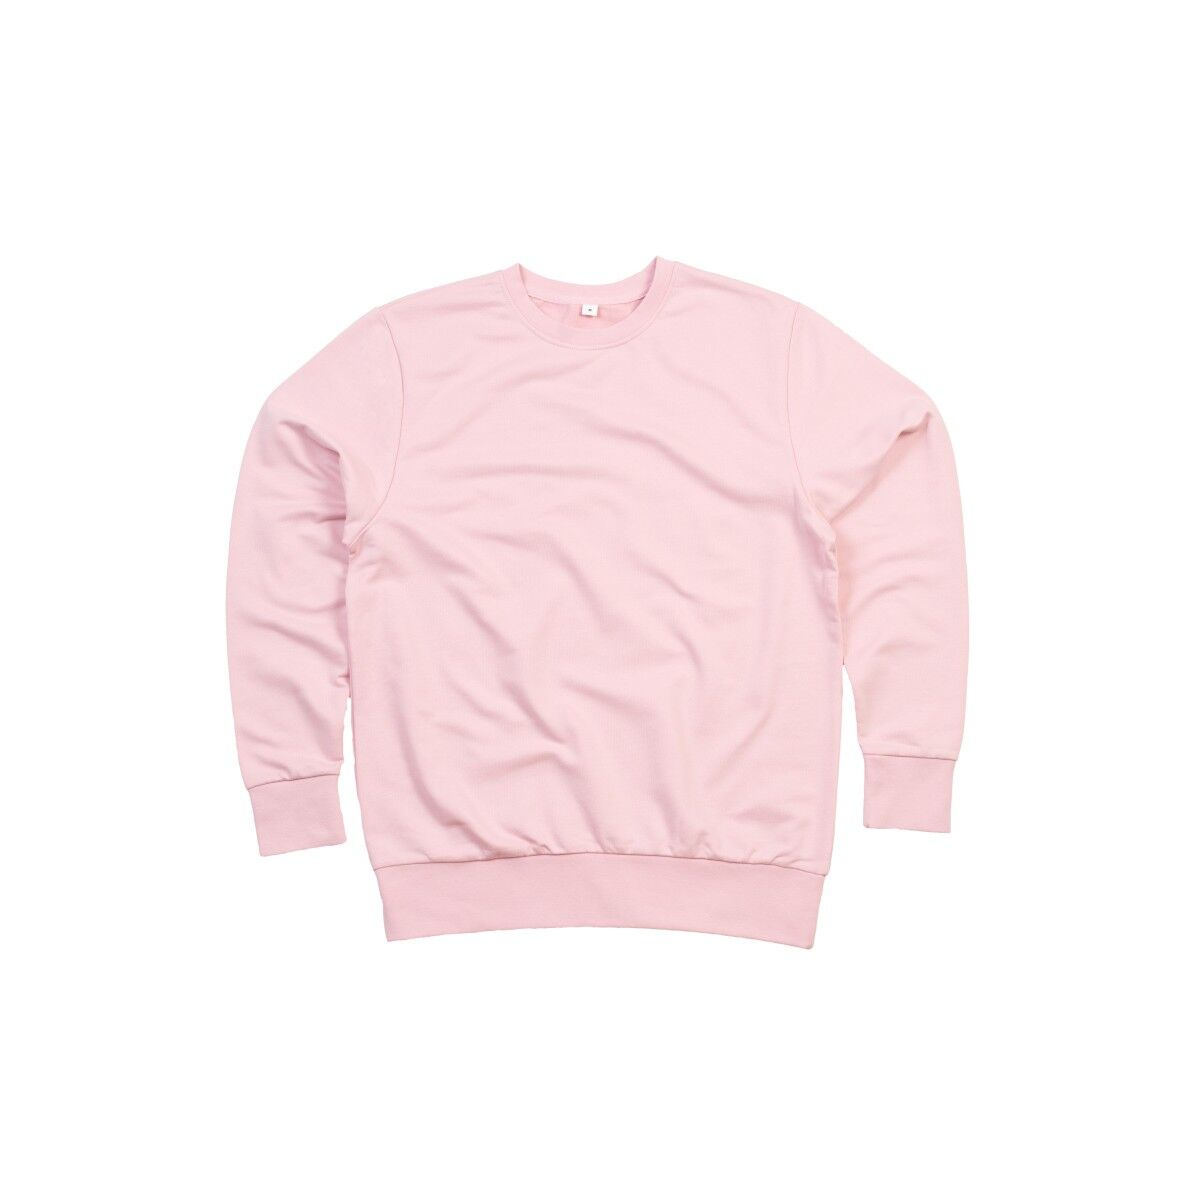 Unisex Mantis Sweatshirt - Soft Pink